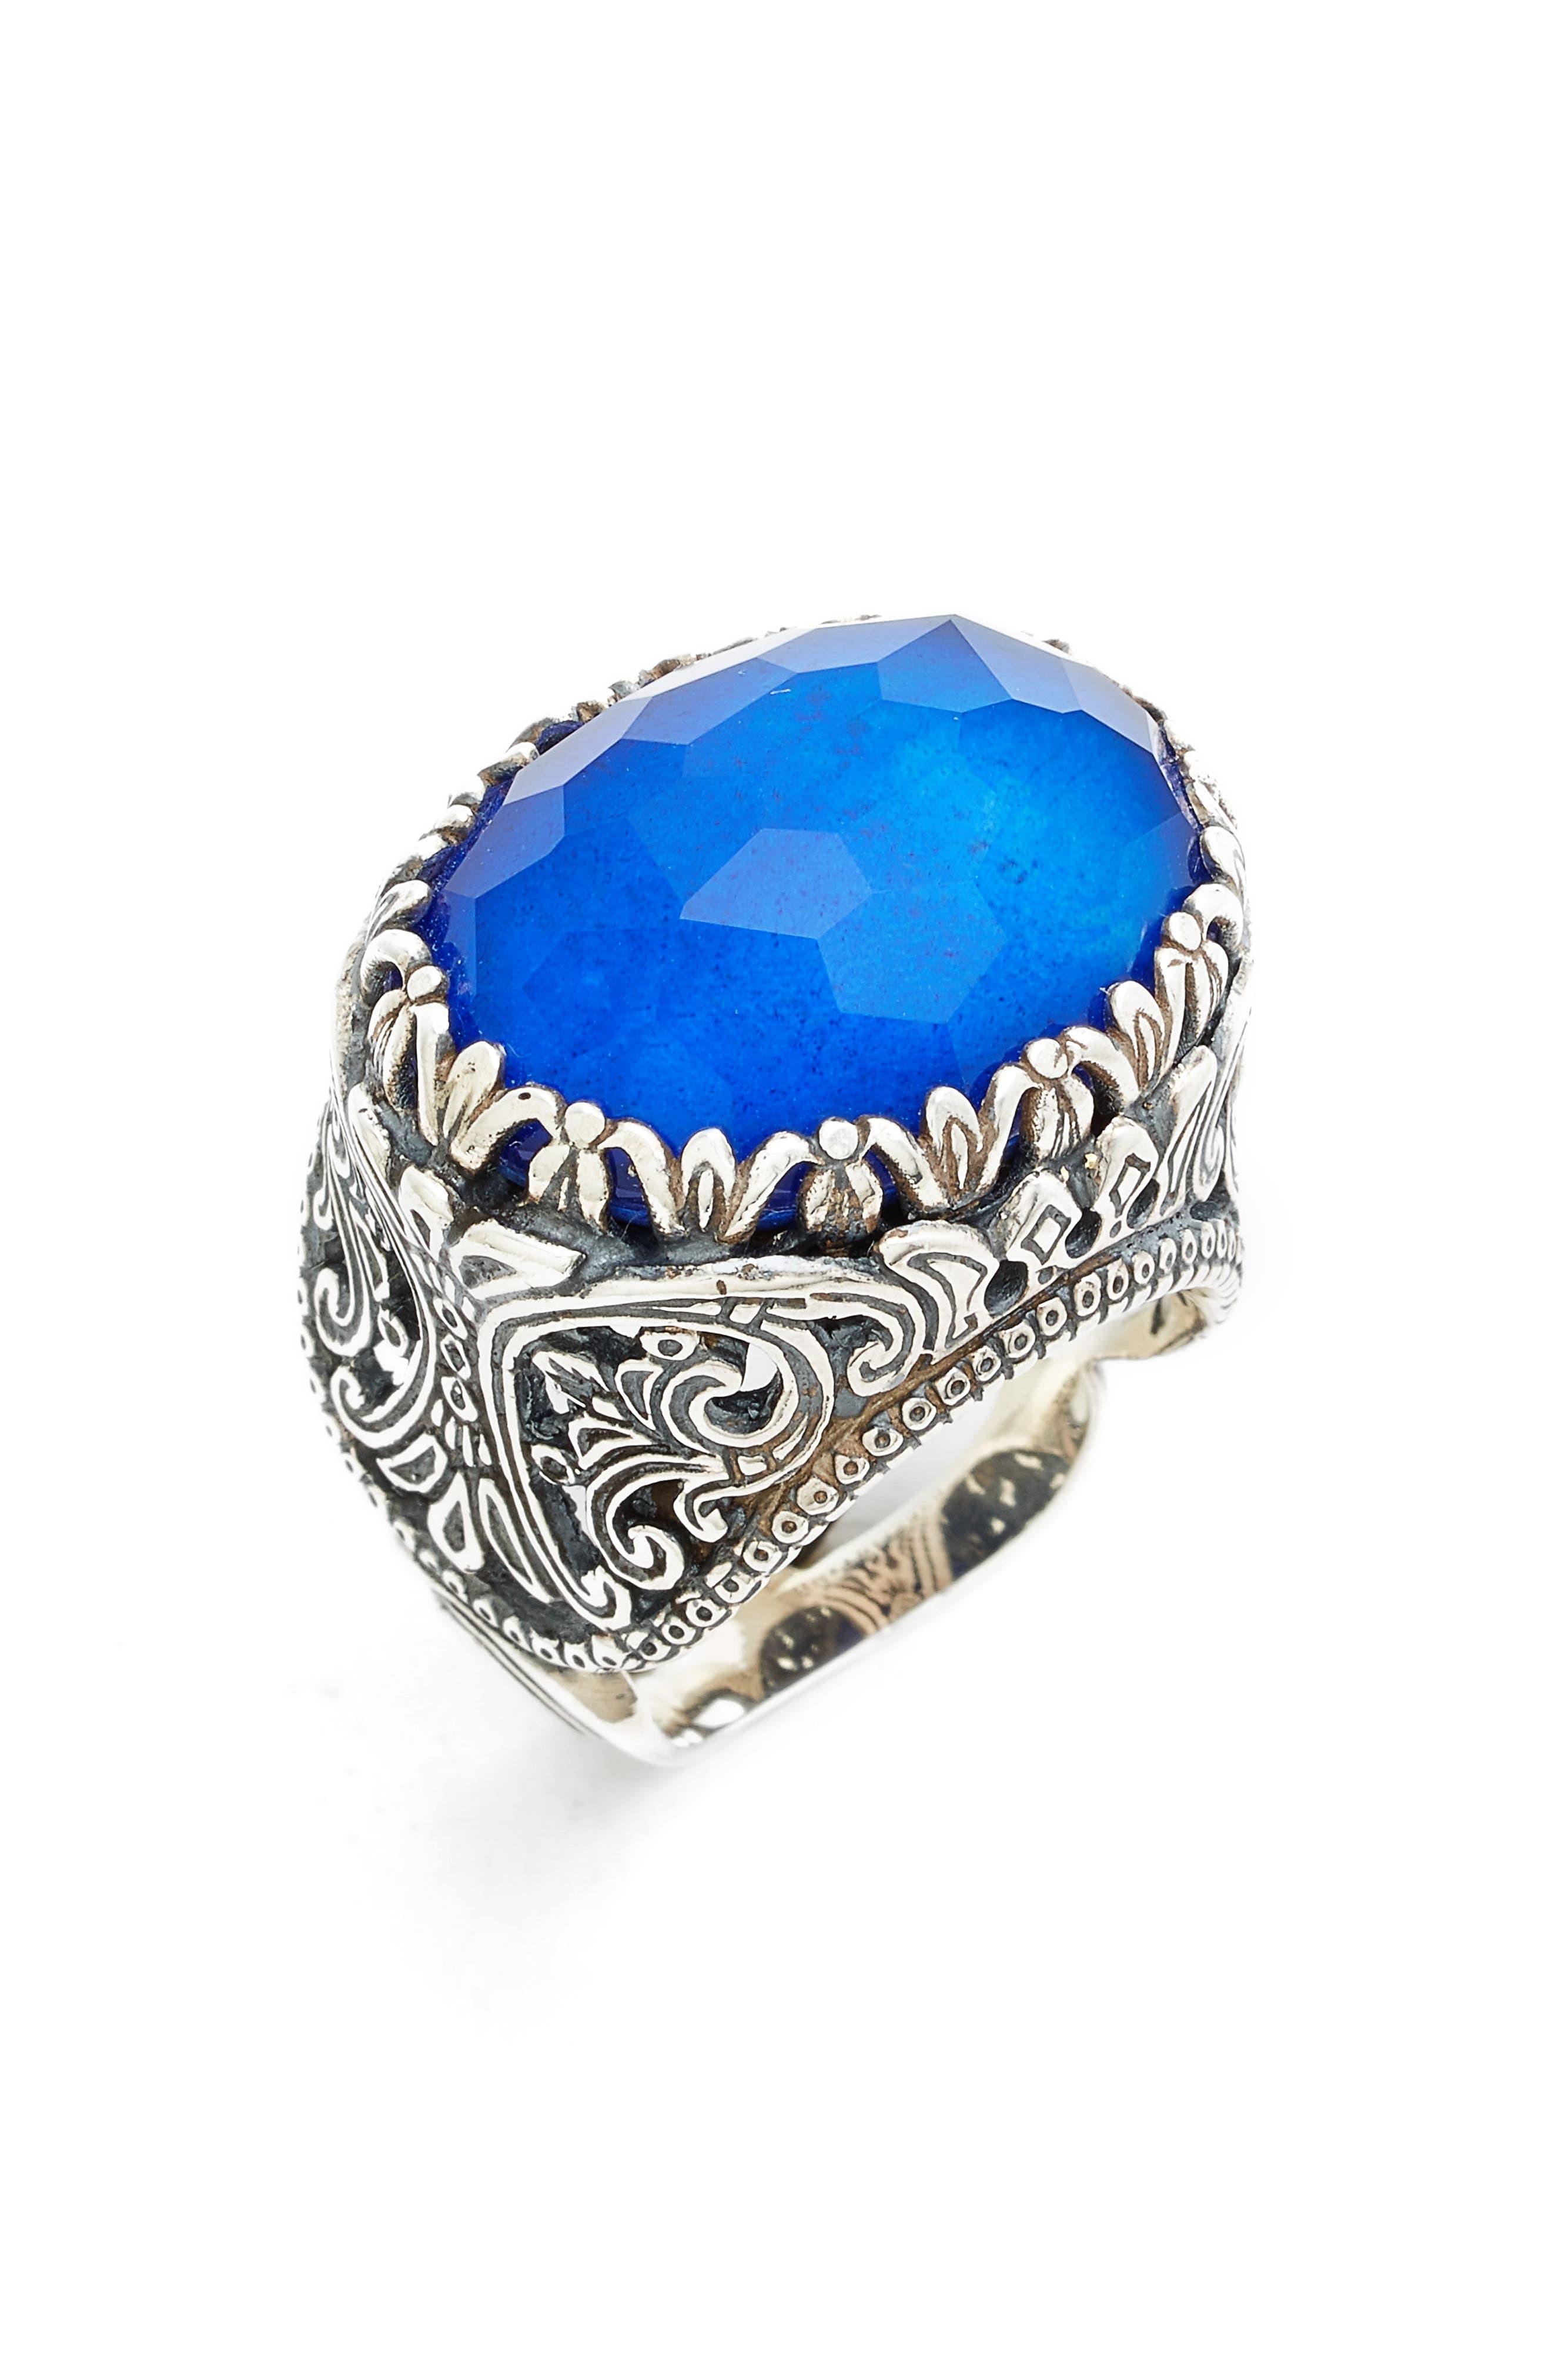 Andromeda Lapis Lazuli Ring,                             Alternate thumbnail 2, color,                             STERLING SILVER